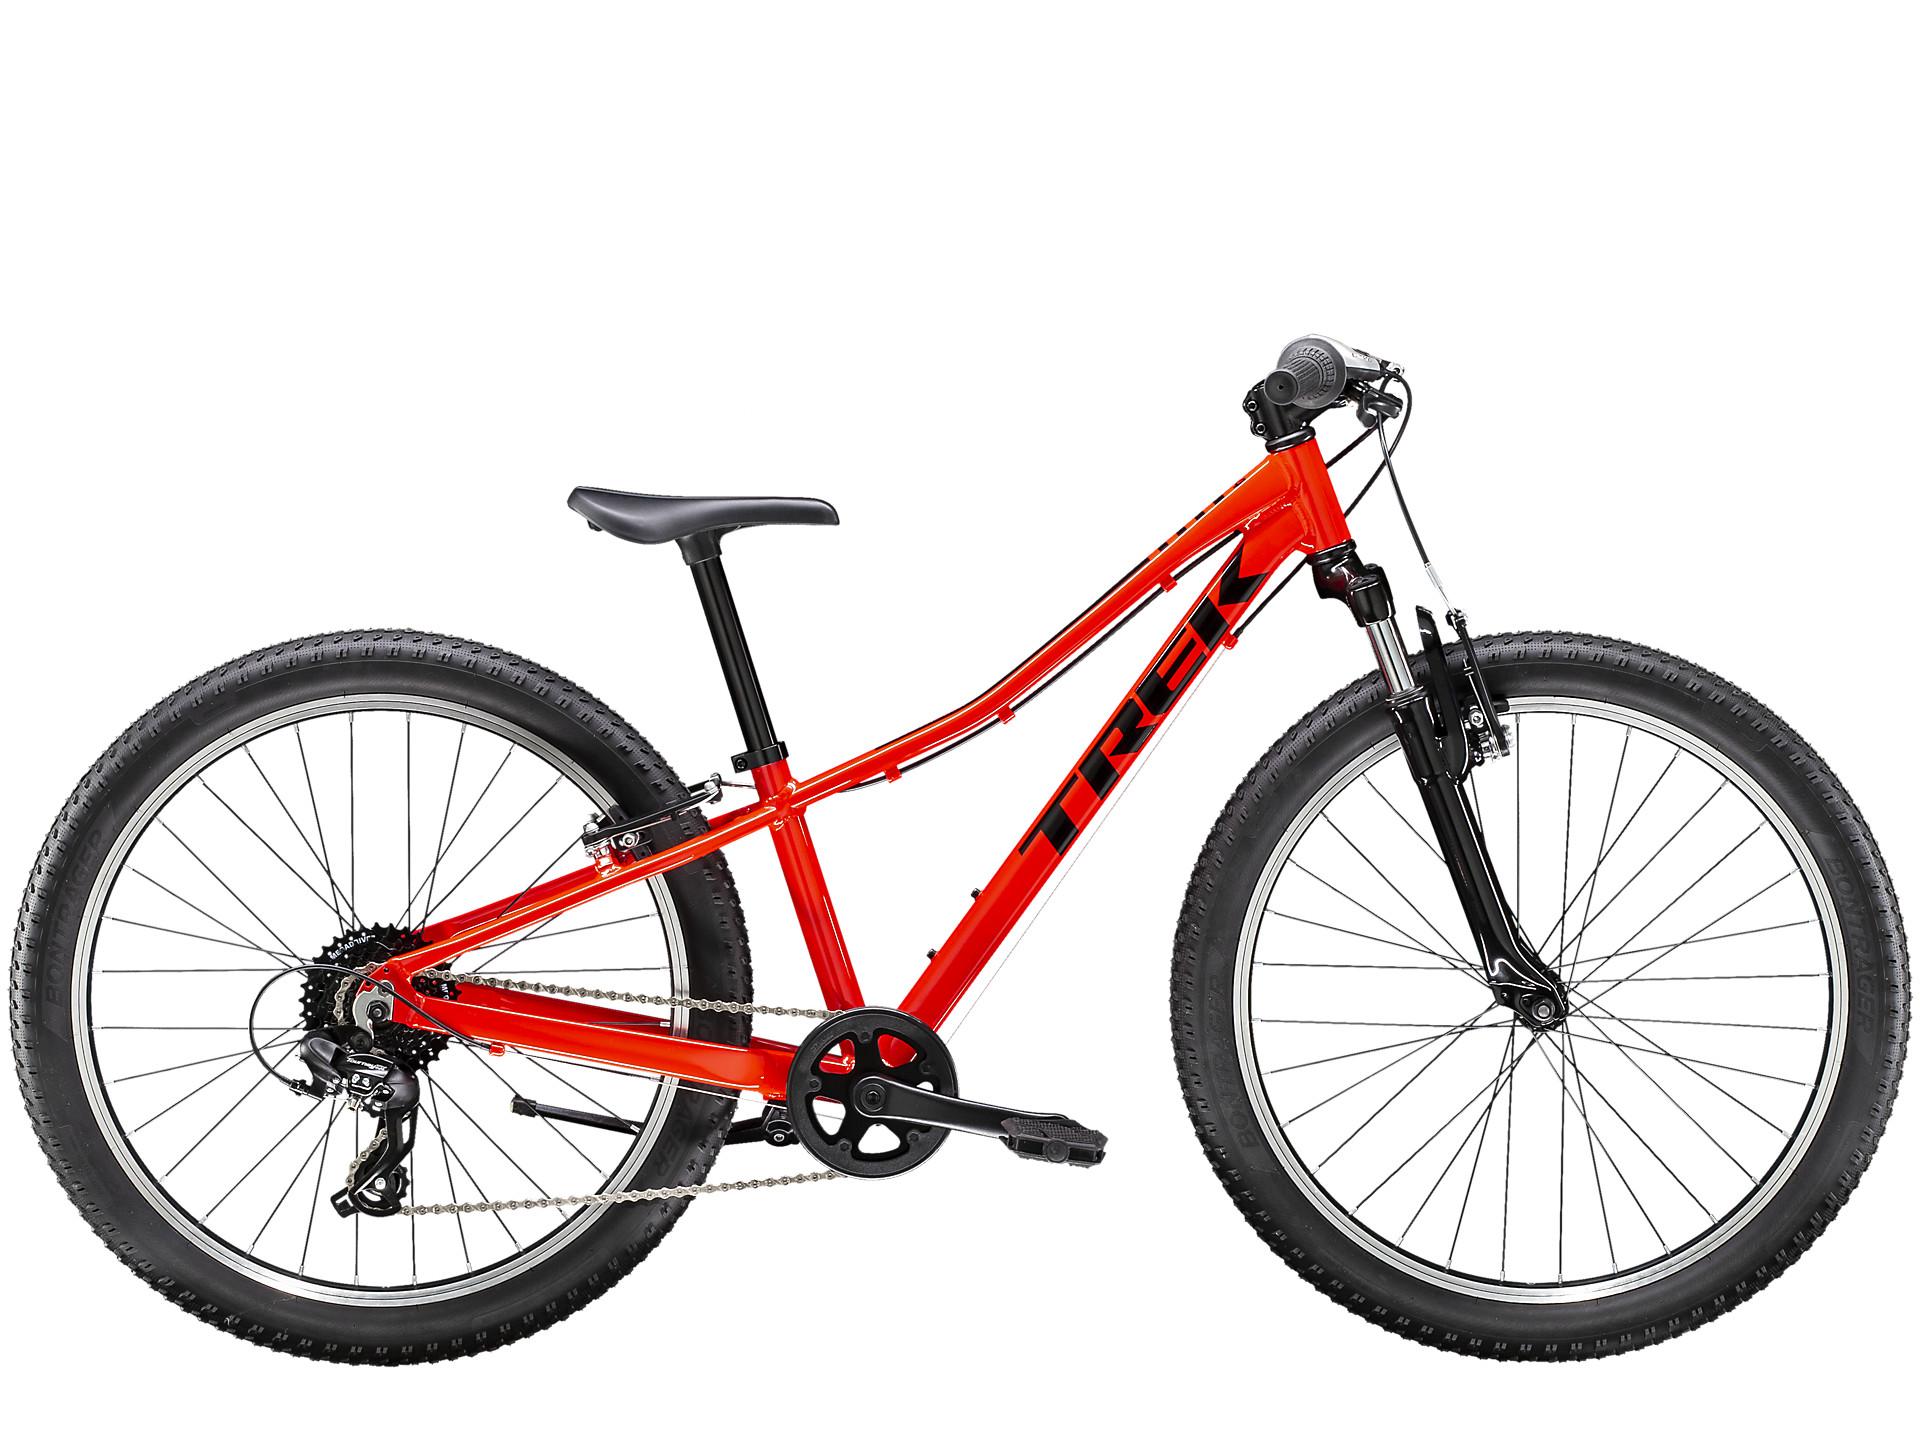 Trek Precaliber 24 8 speed Suspension Boys Kids Bike 2021 Red